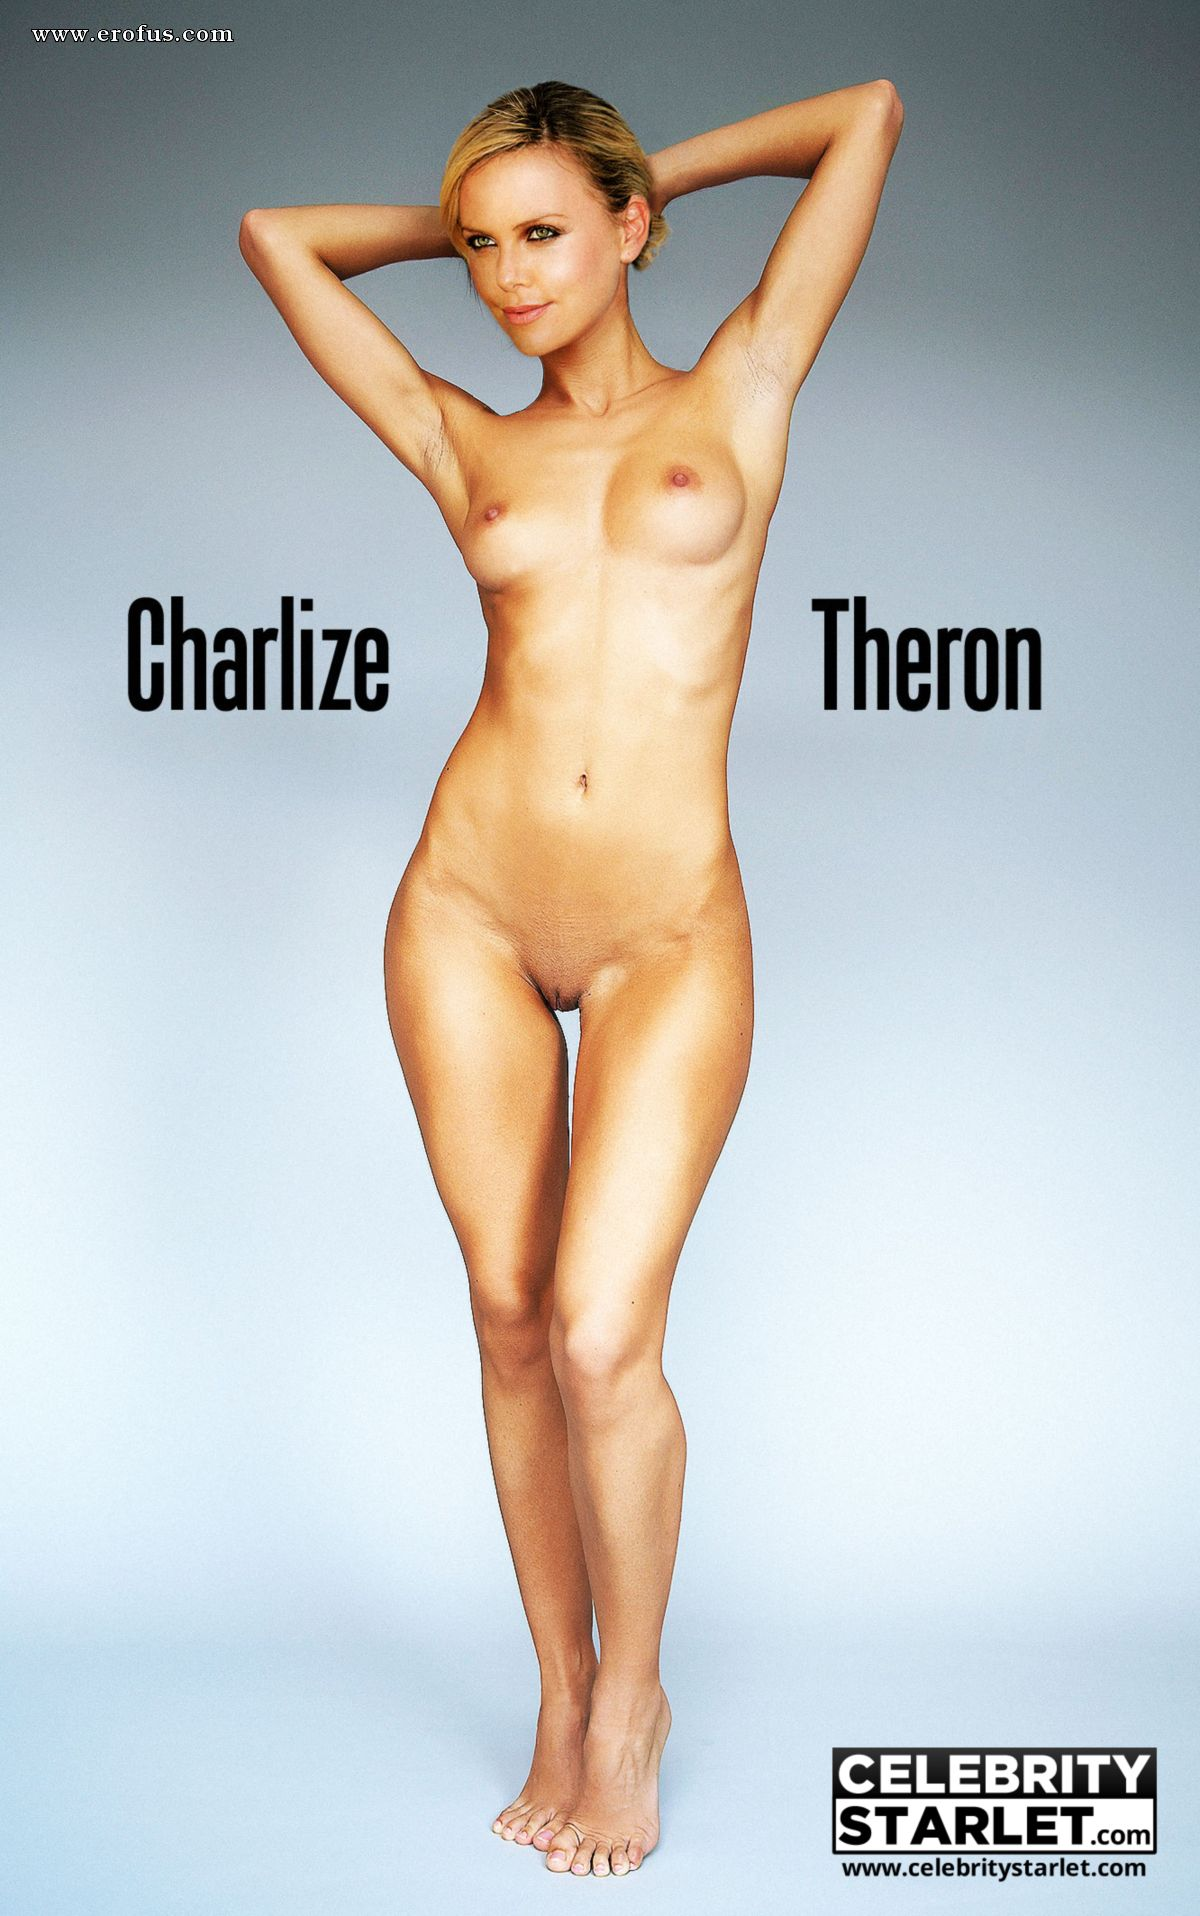 Charlize Theron Nude Playboy Playmate